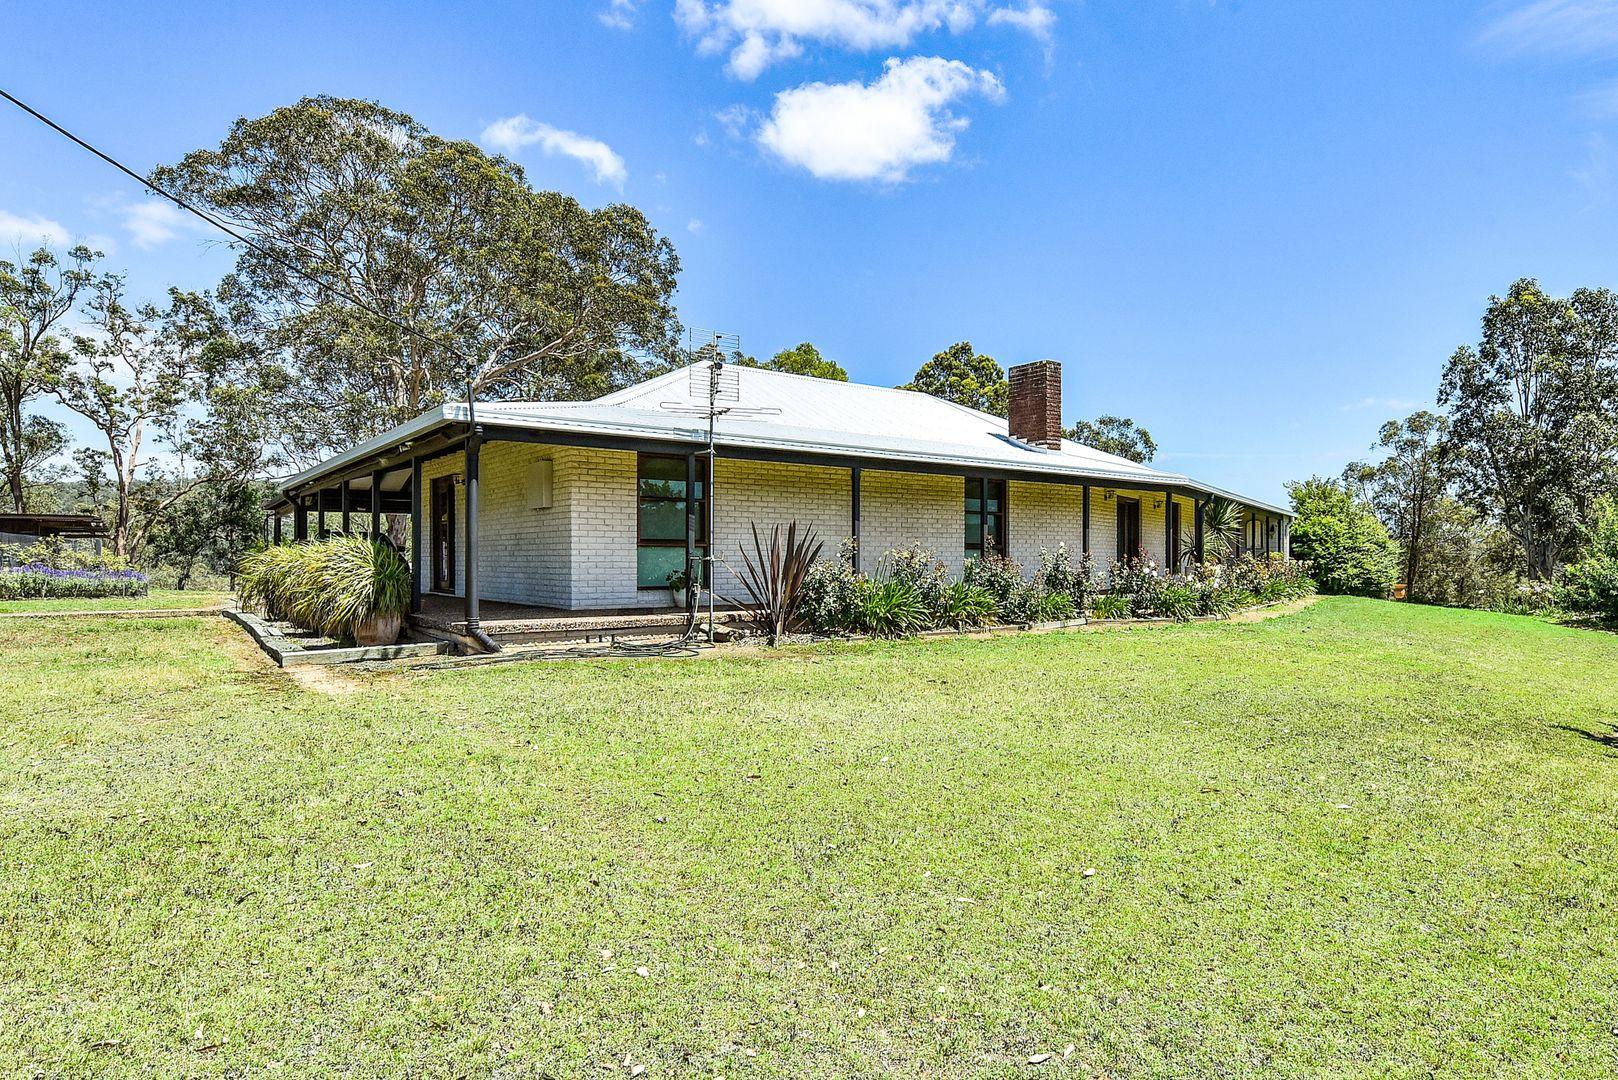 45 Yango Creek Rd, Wollombi NSW 2325, Image 2